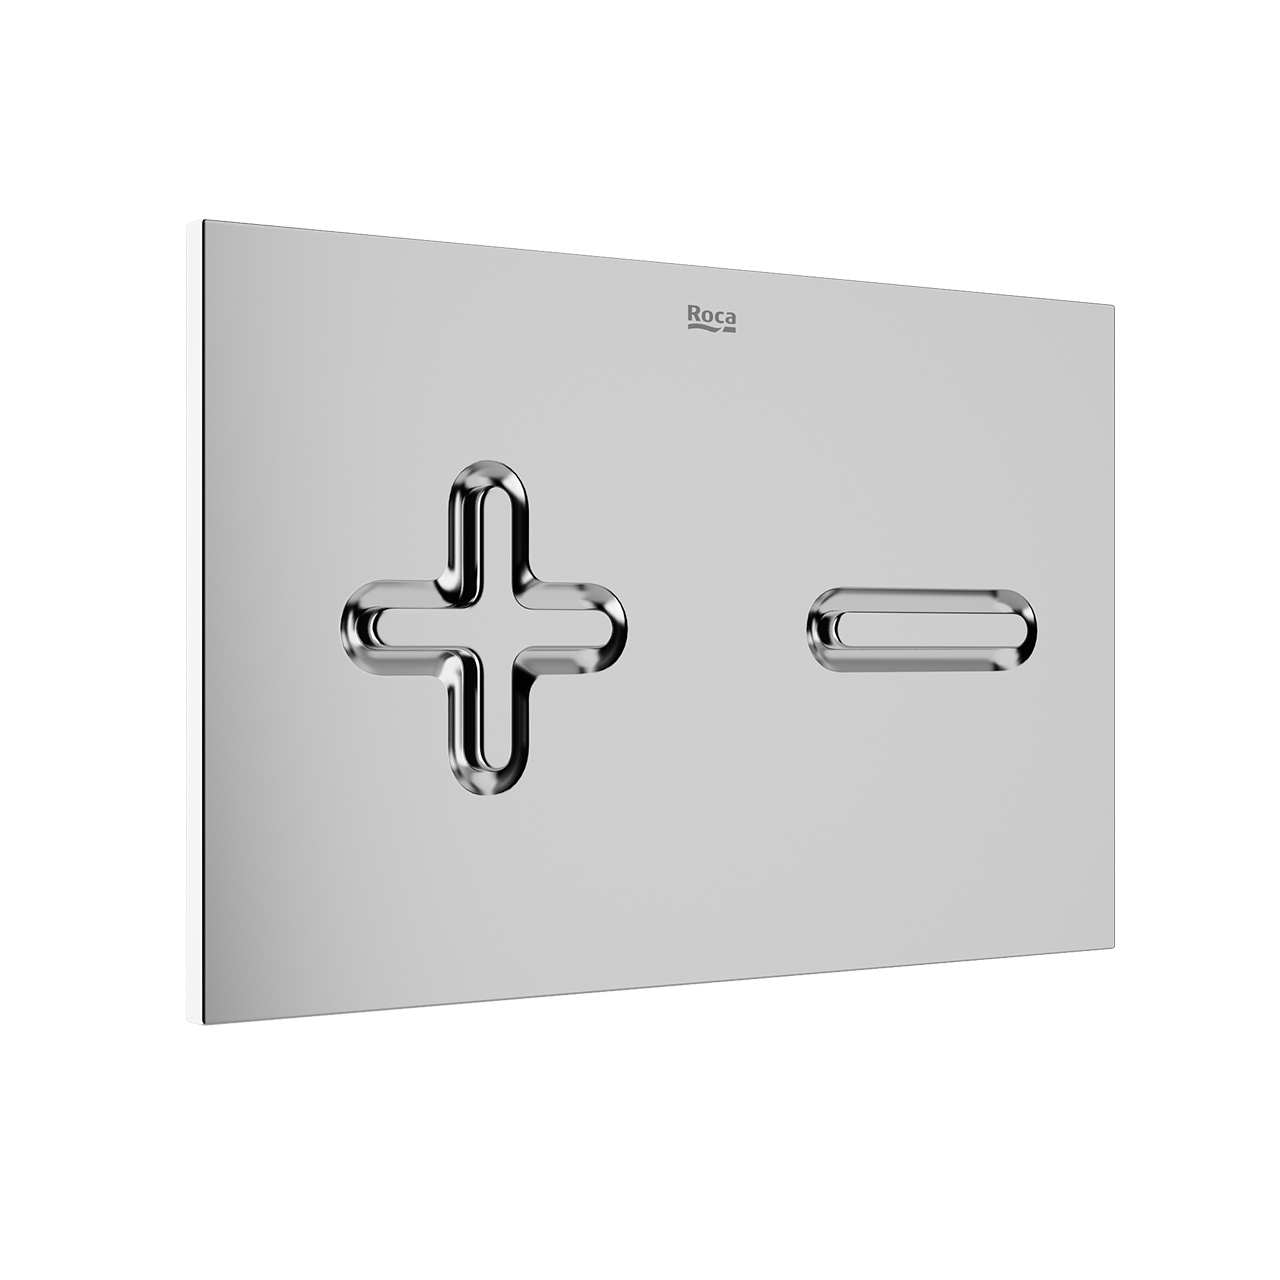 PL6 Dual Flush Plate by Roca